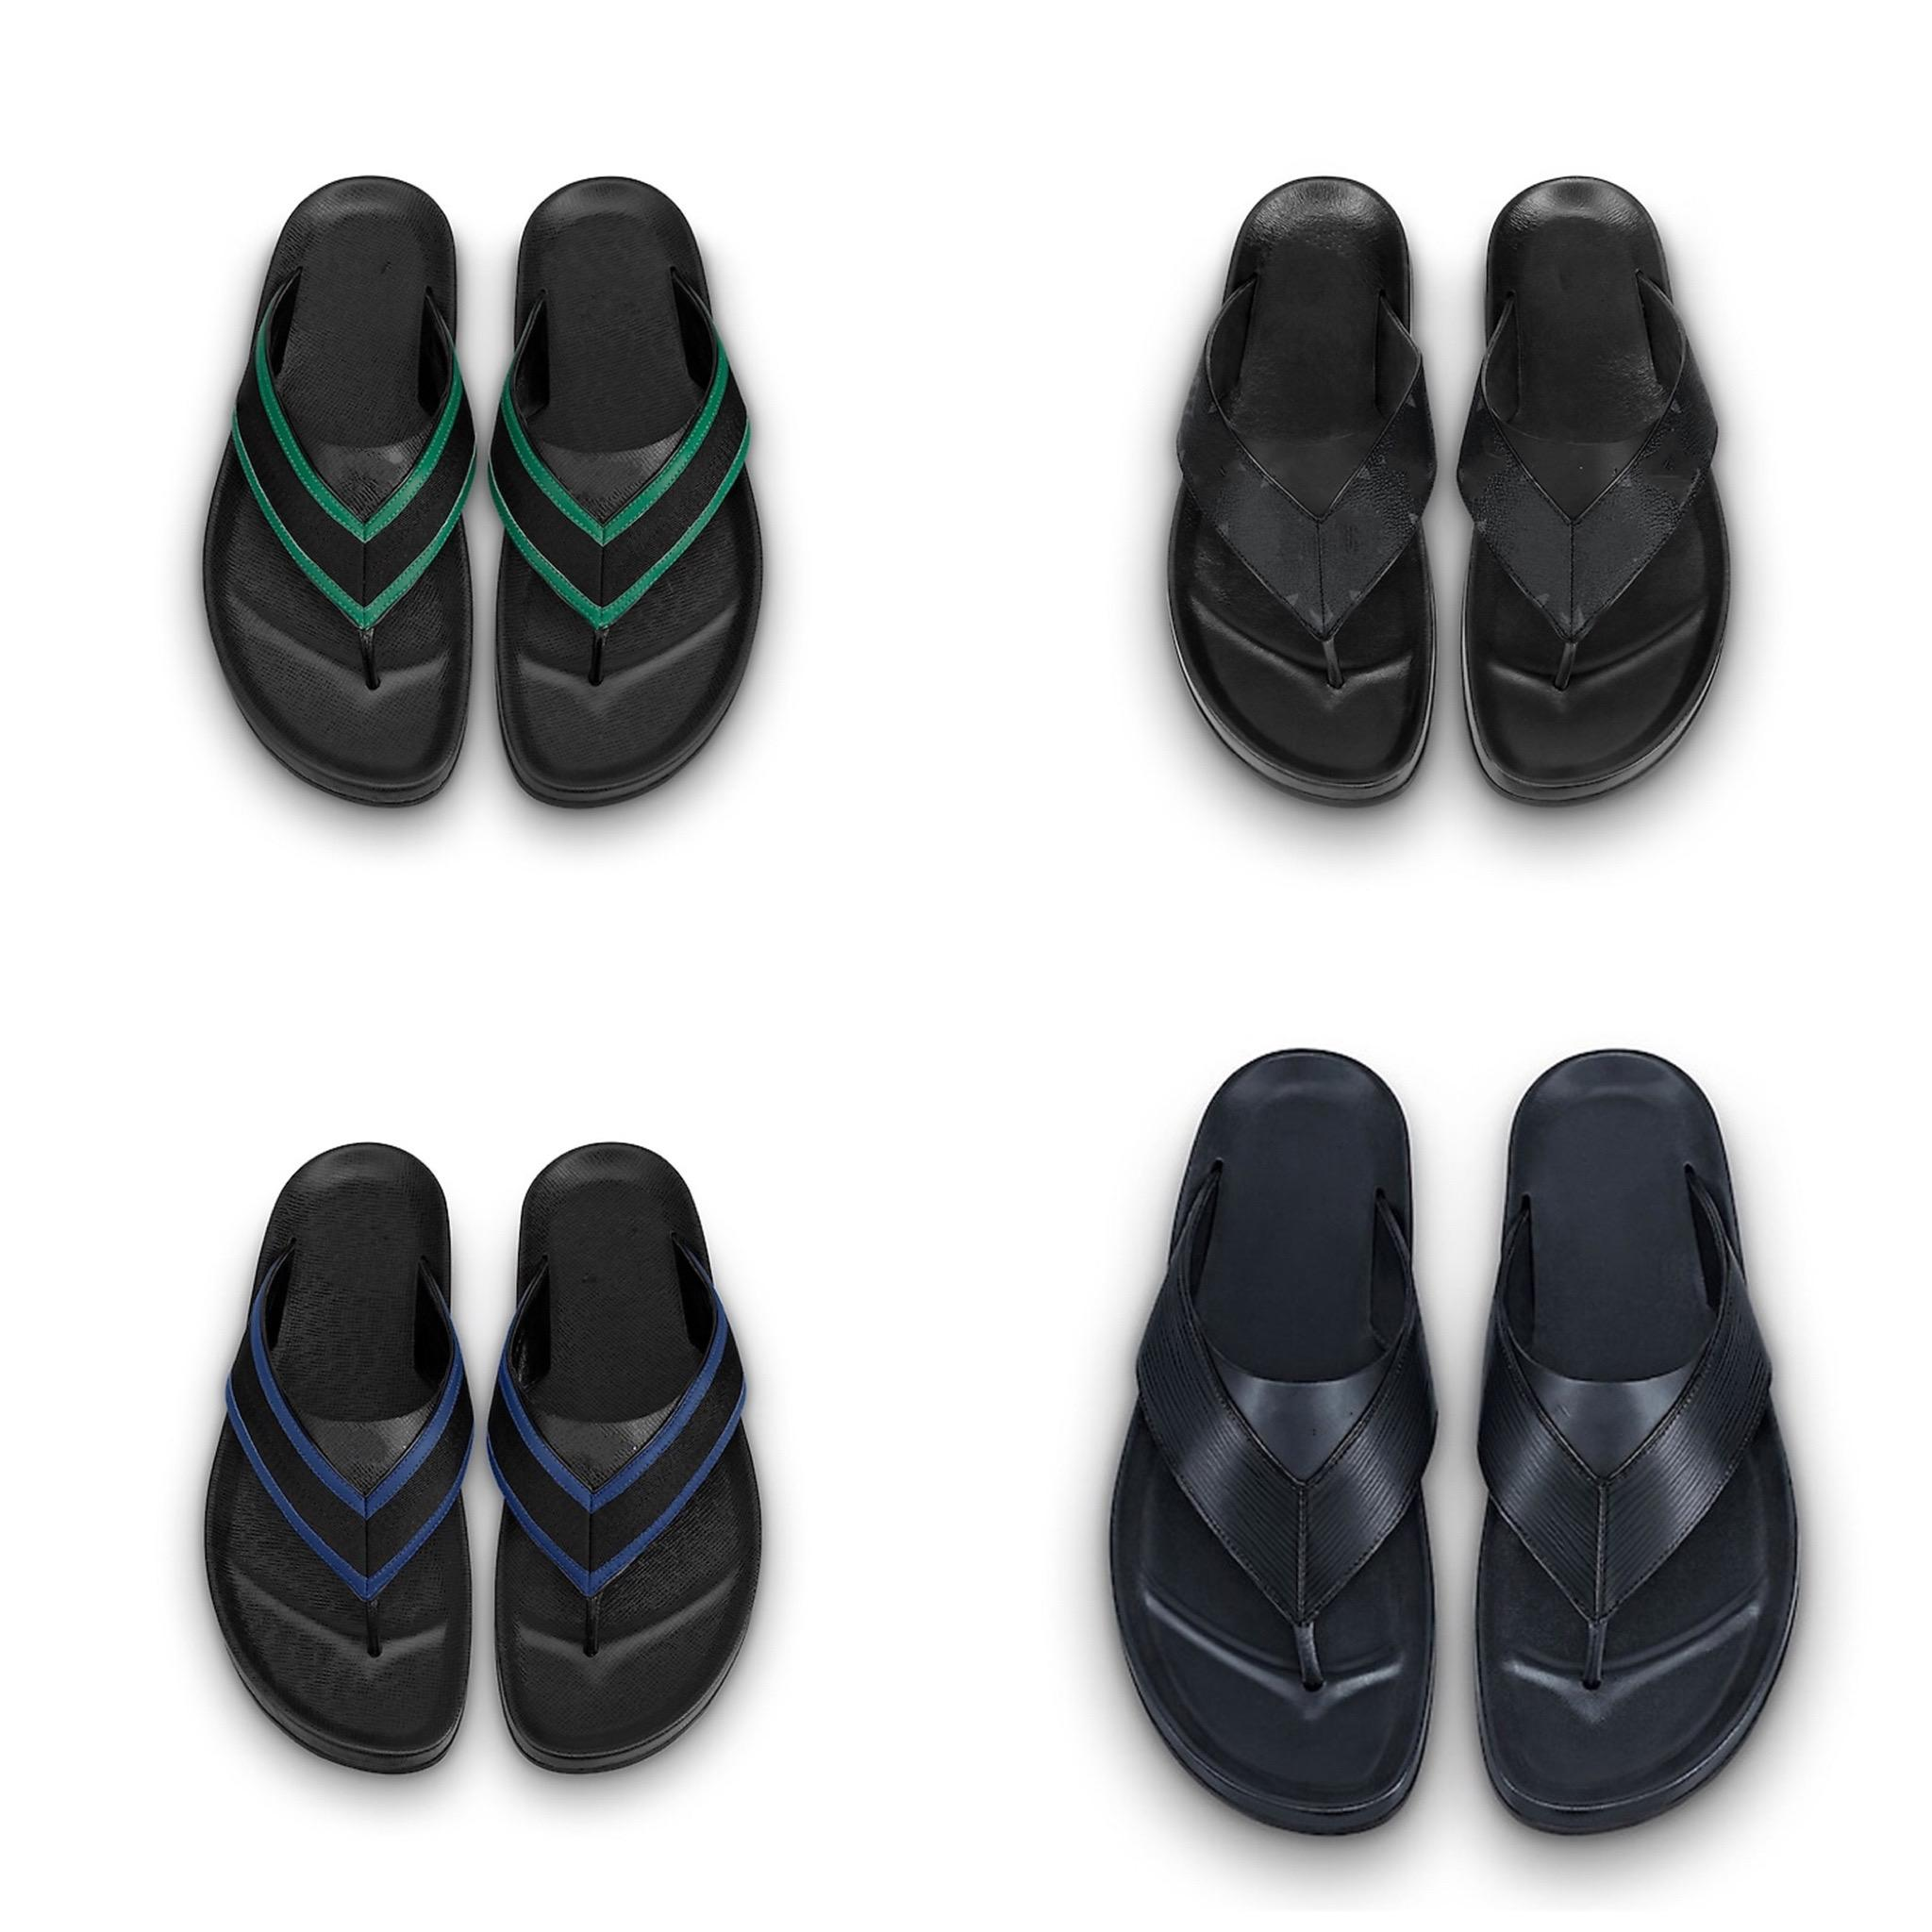 Popular Big Beach Shoes Flip-Flops Sandals resistente ao desgaste Designer EVA chinelos flip-flops.